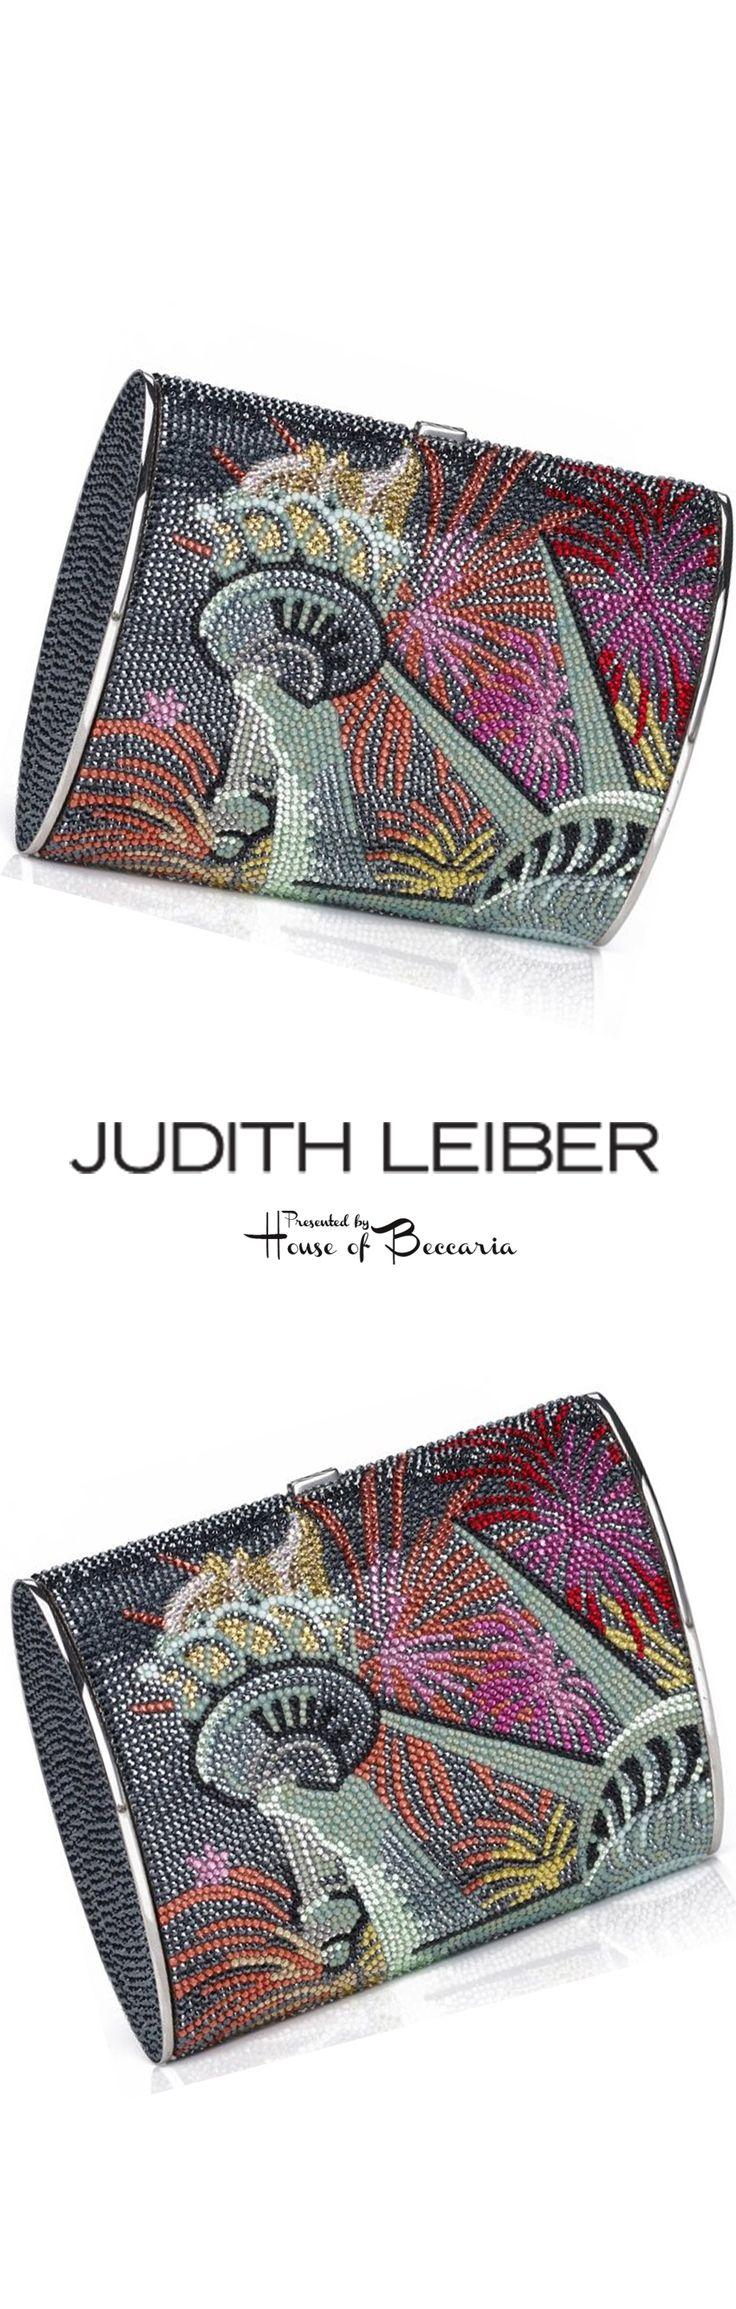 "~Judith Leiber ""Lady Liberty"" Swarovski Crystal Clutch Bag | House of Beccaria#"